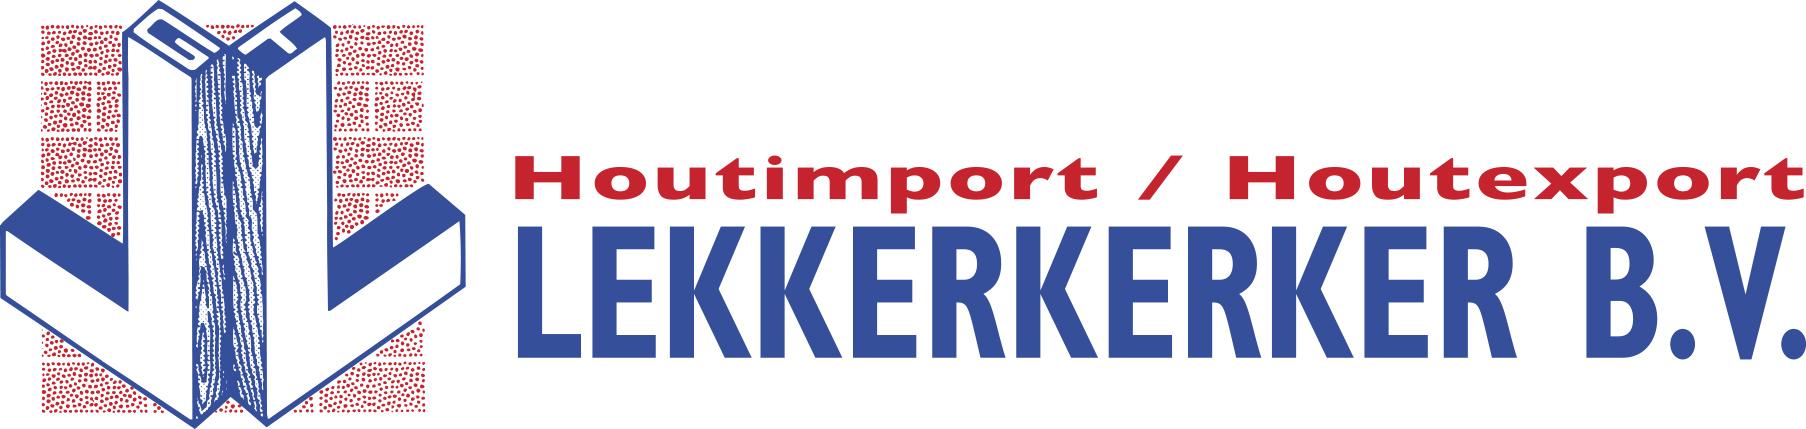 Houtimport Lekkerkerker